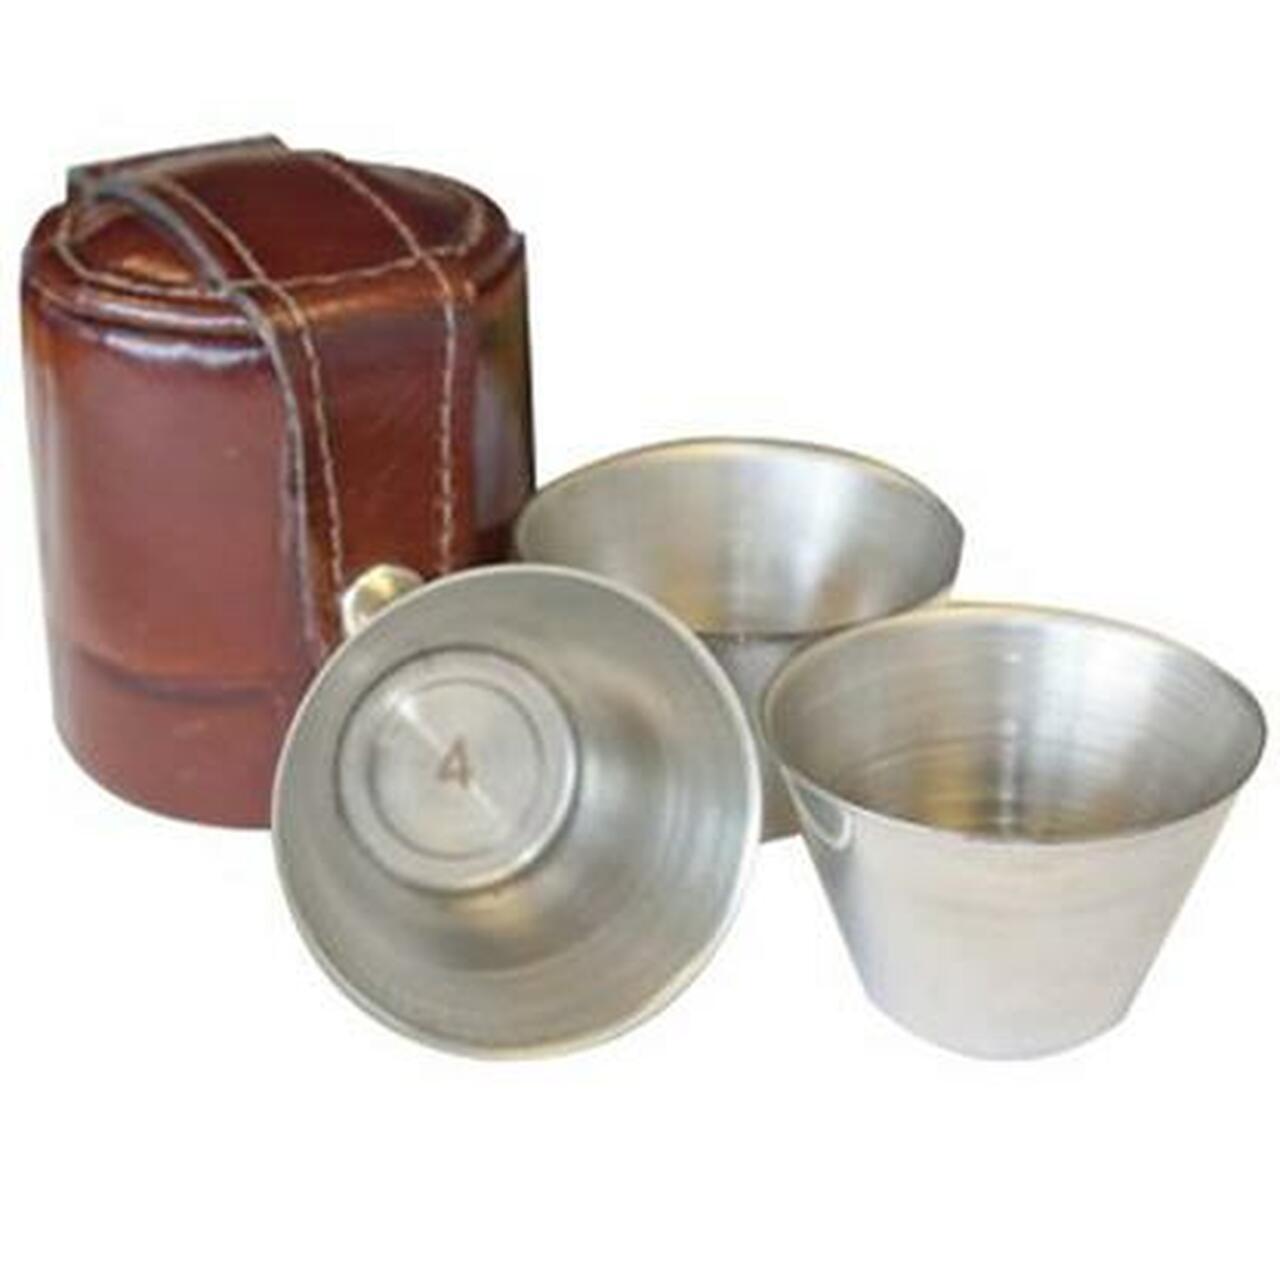 Bisley 1oz Cup Set of 10